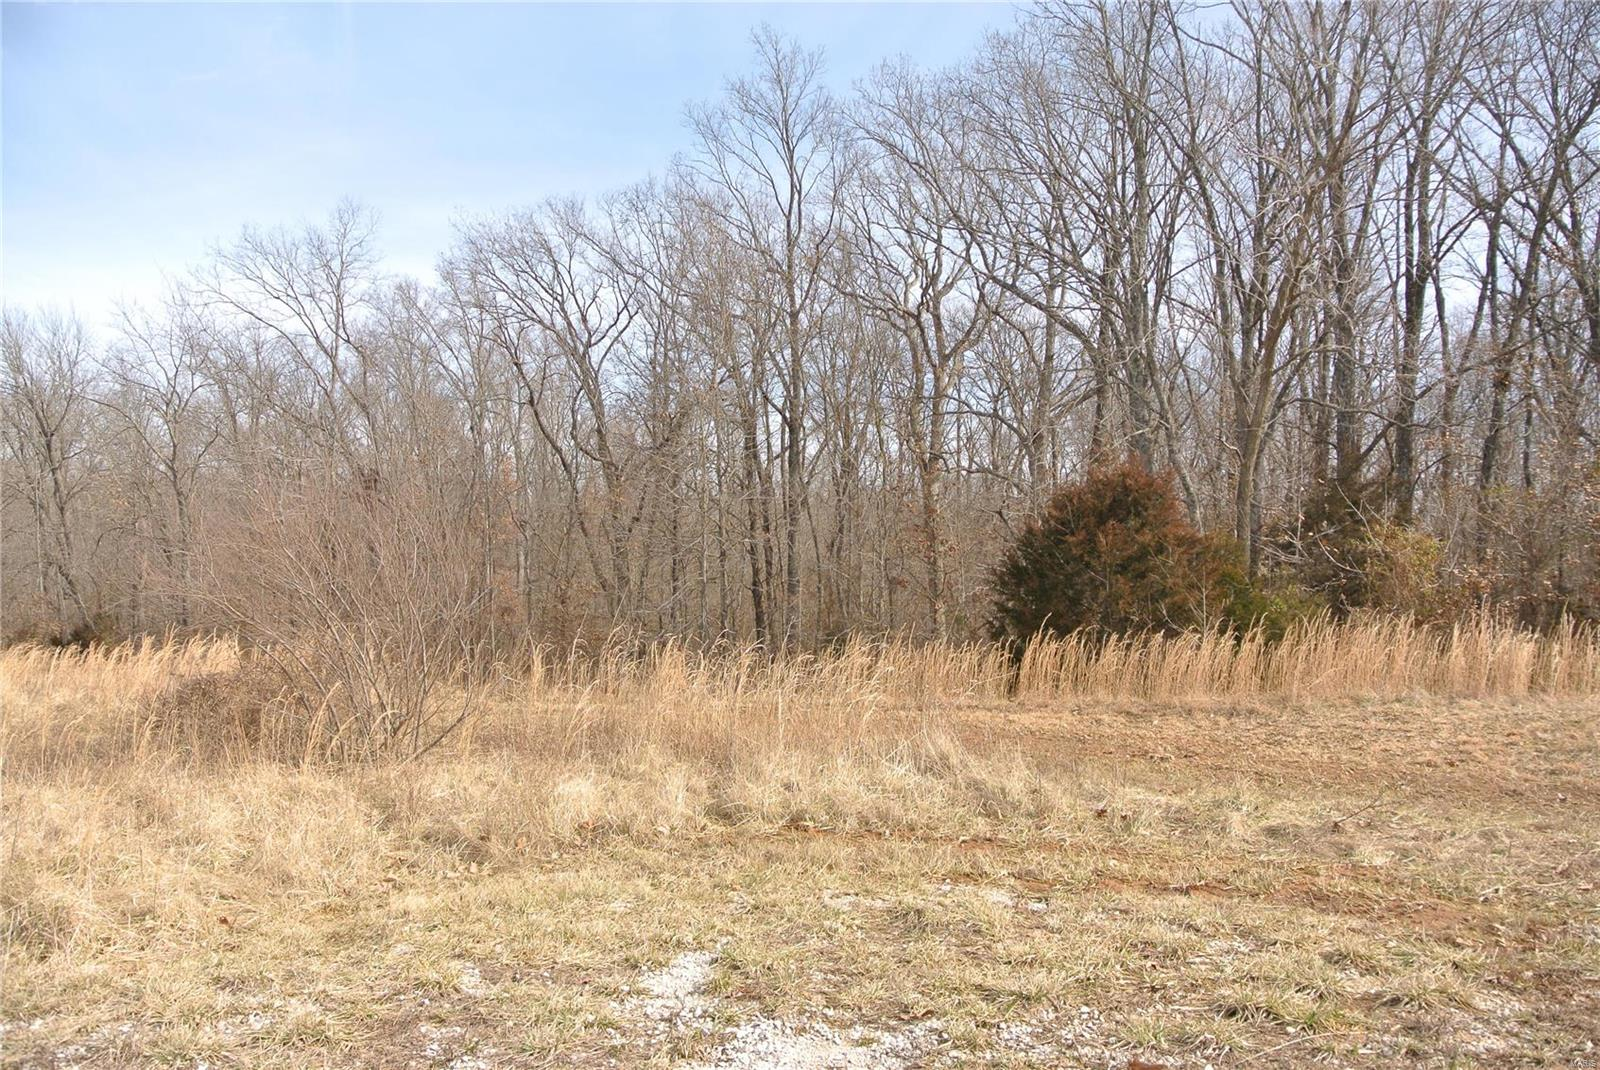 0 lot 34 Woods View Lane Property Photo 1